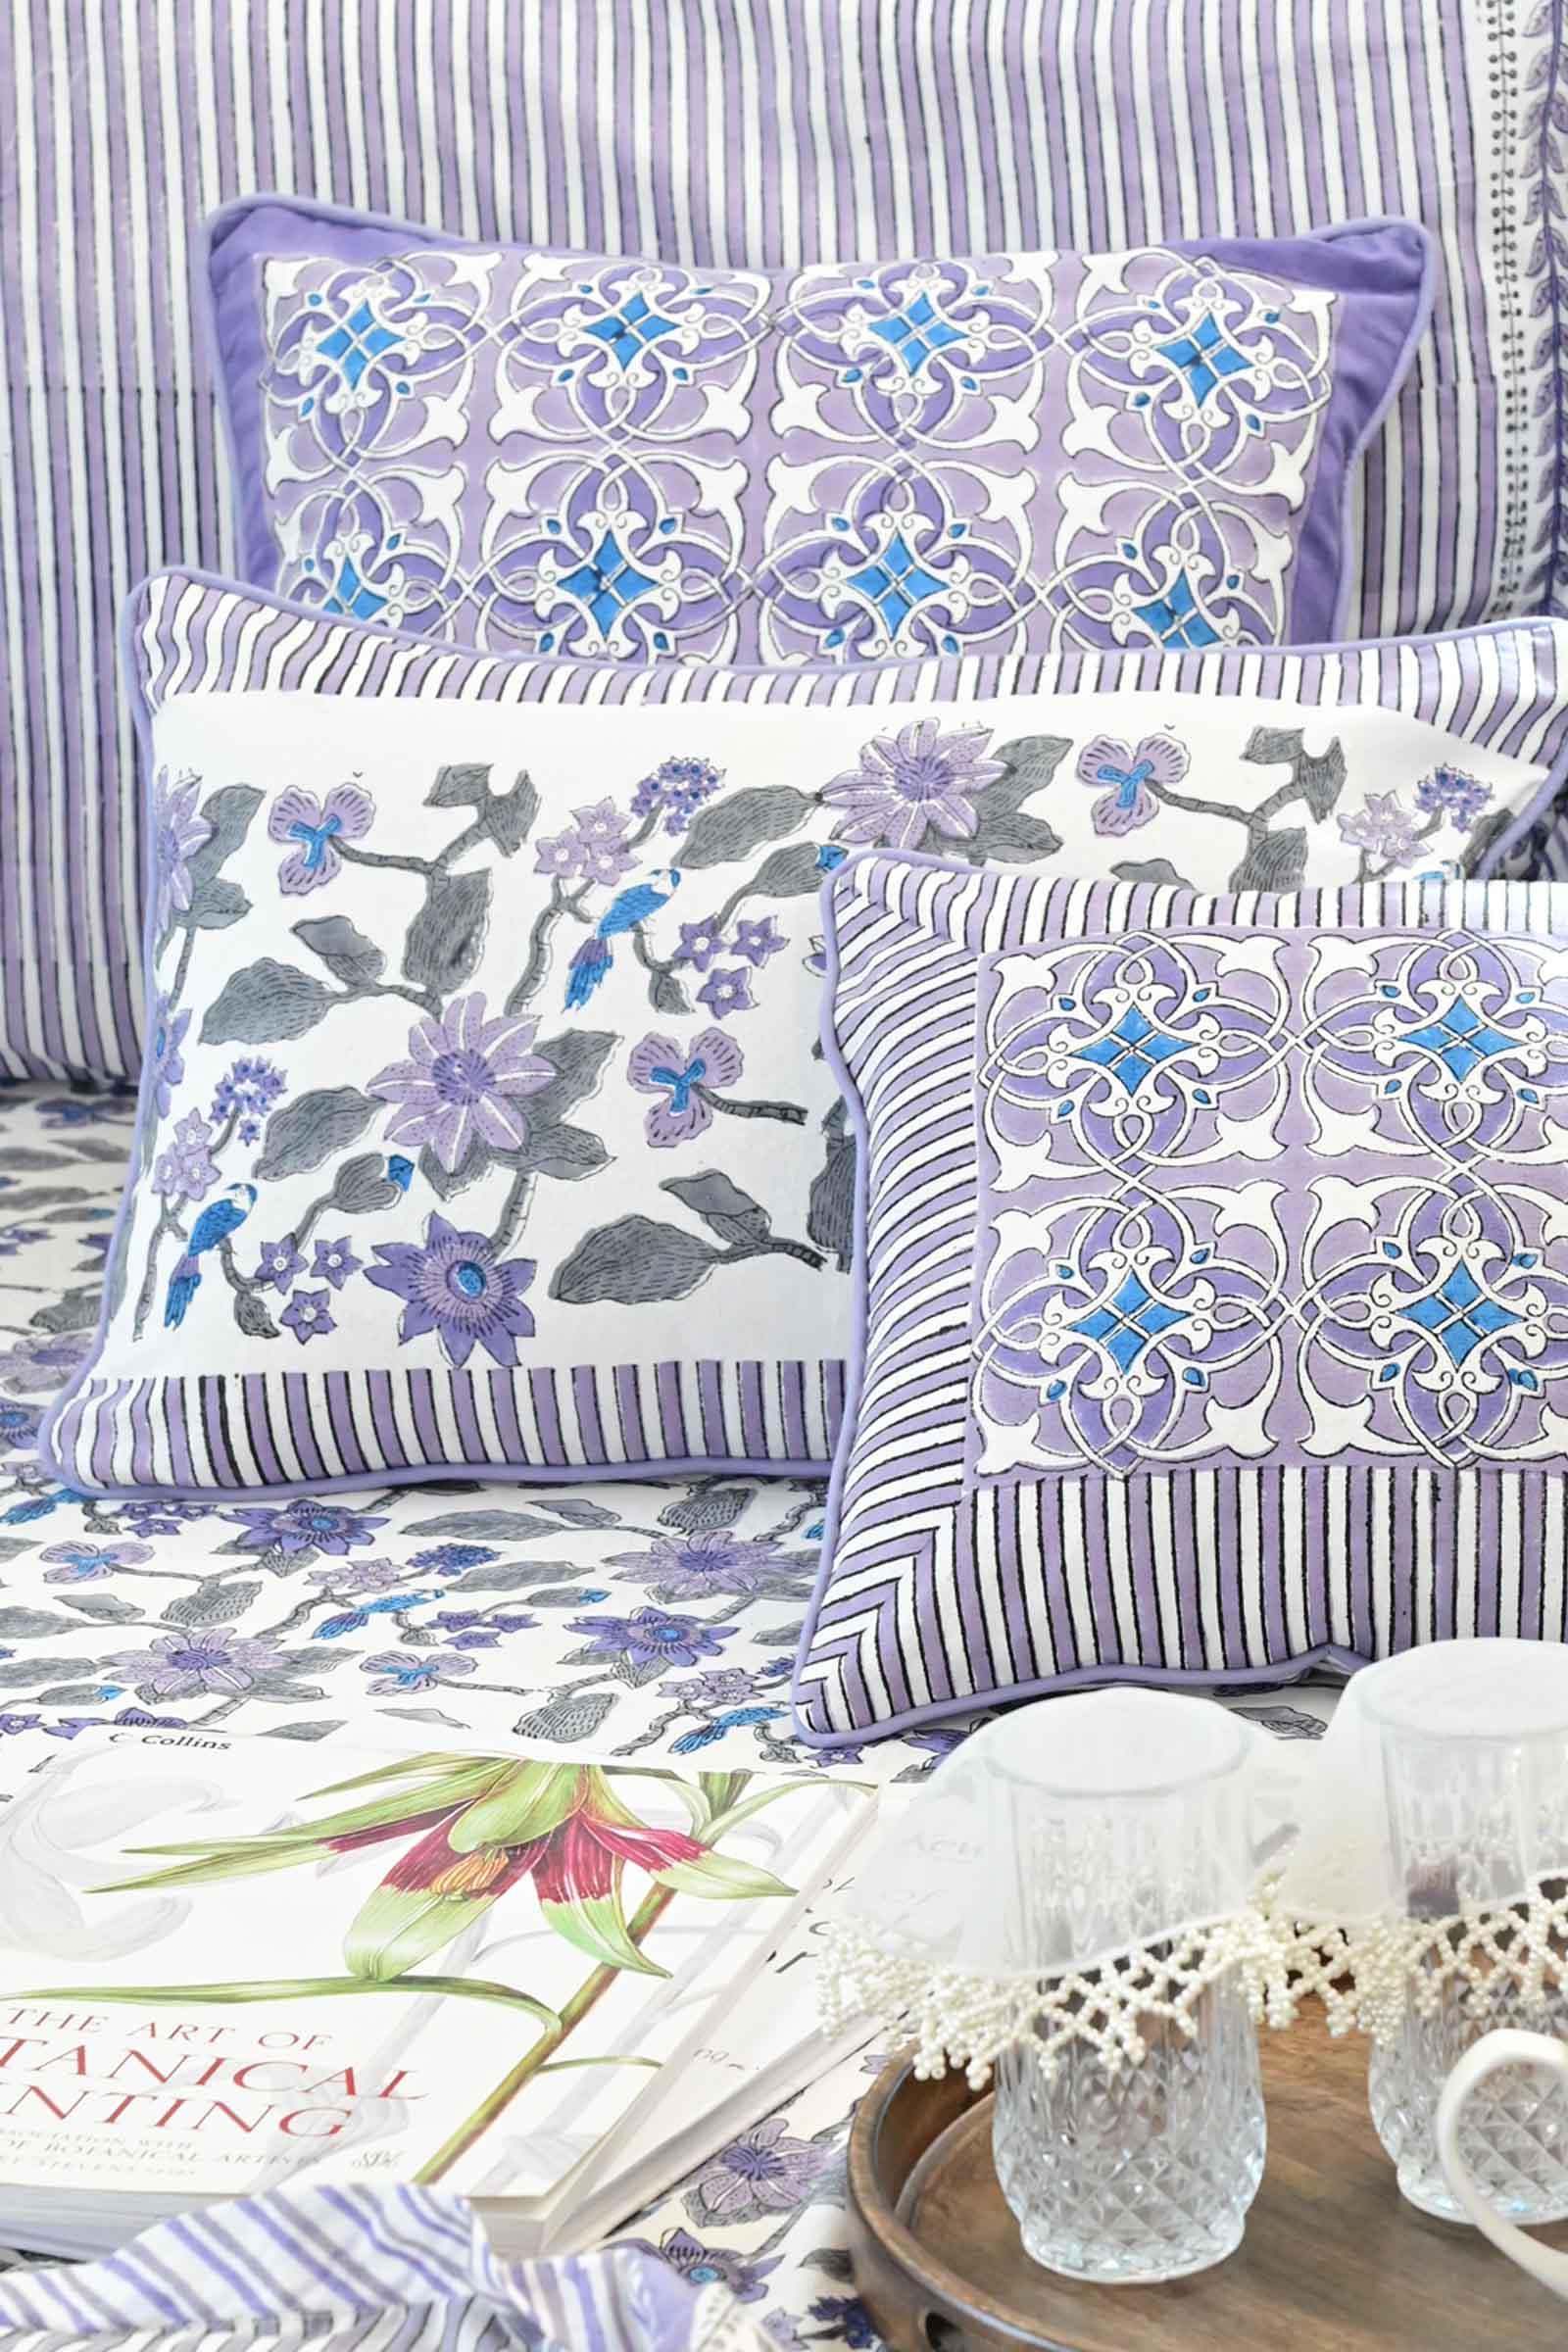 Artistic Lavender 12*18 Cushion Cover